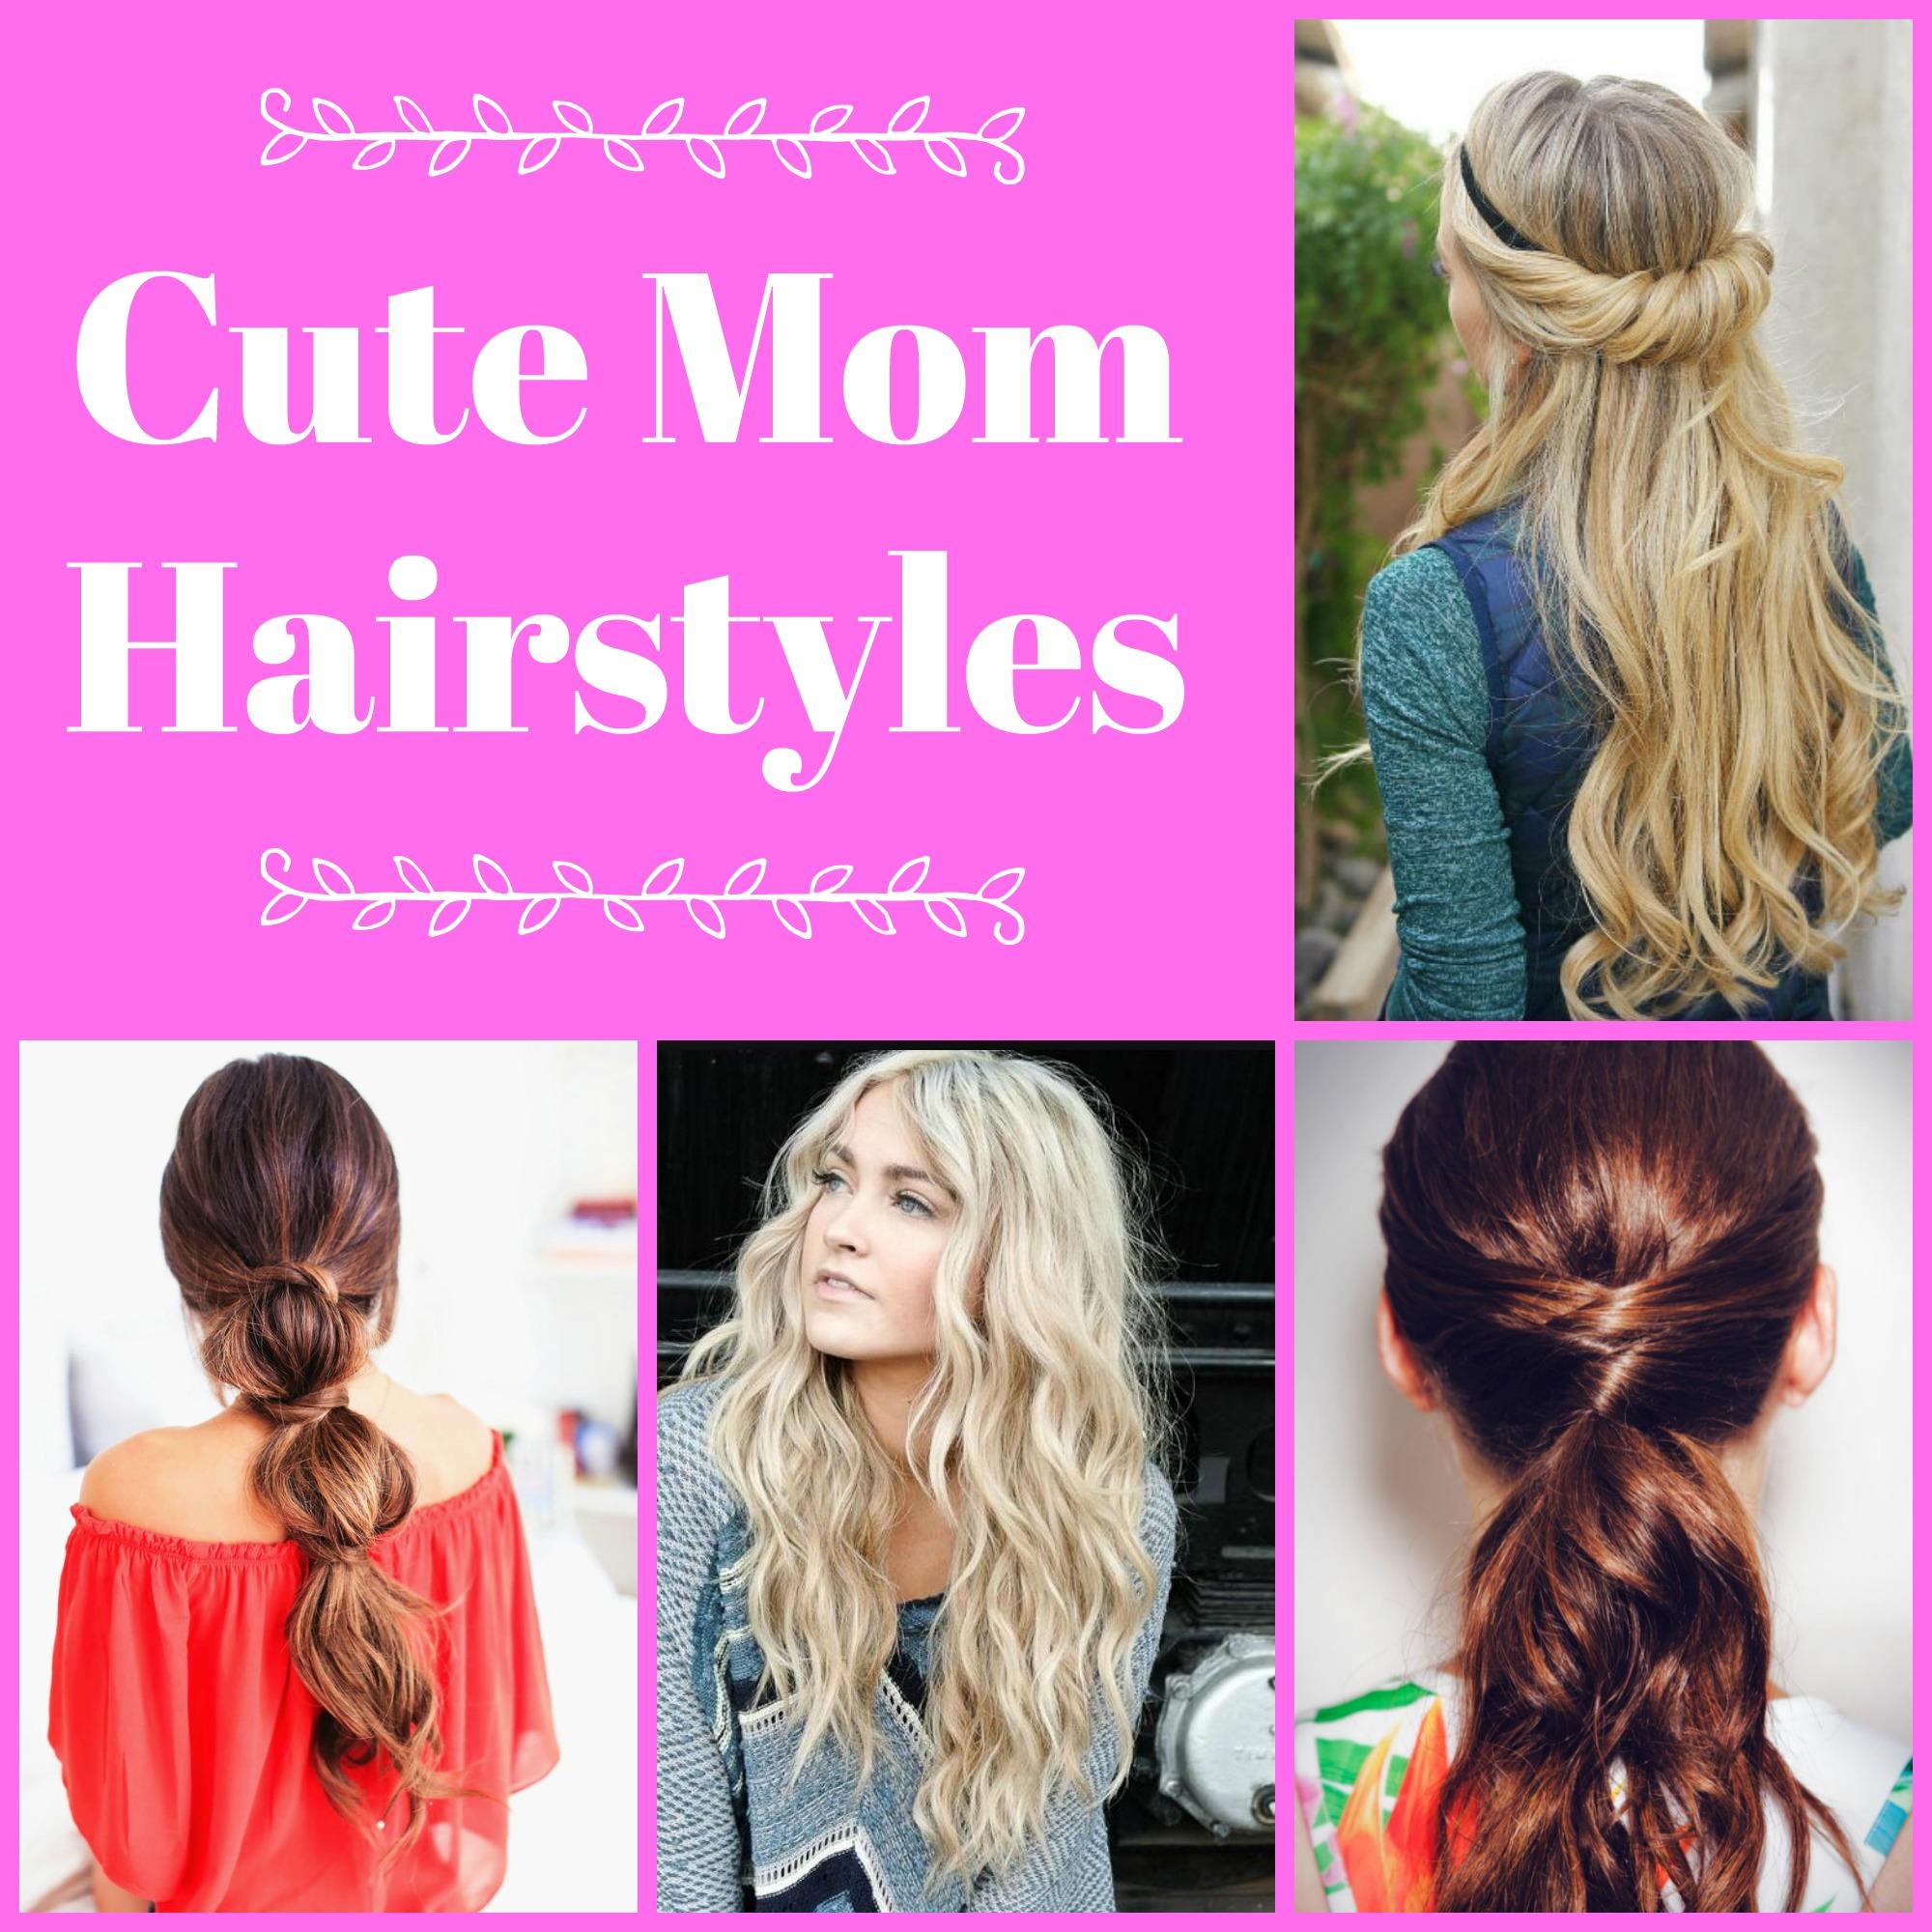 Cute Mom Hairstyles